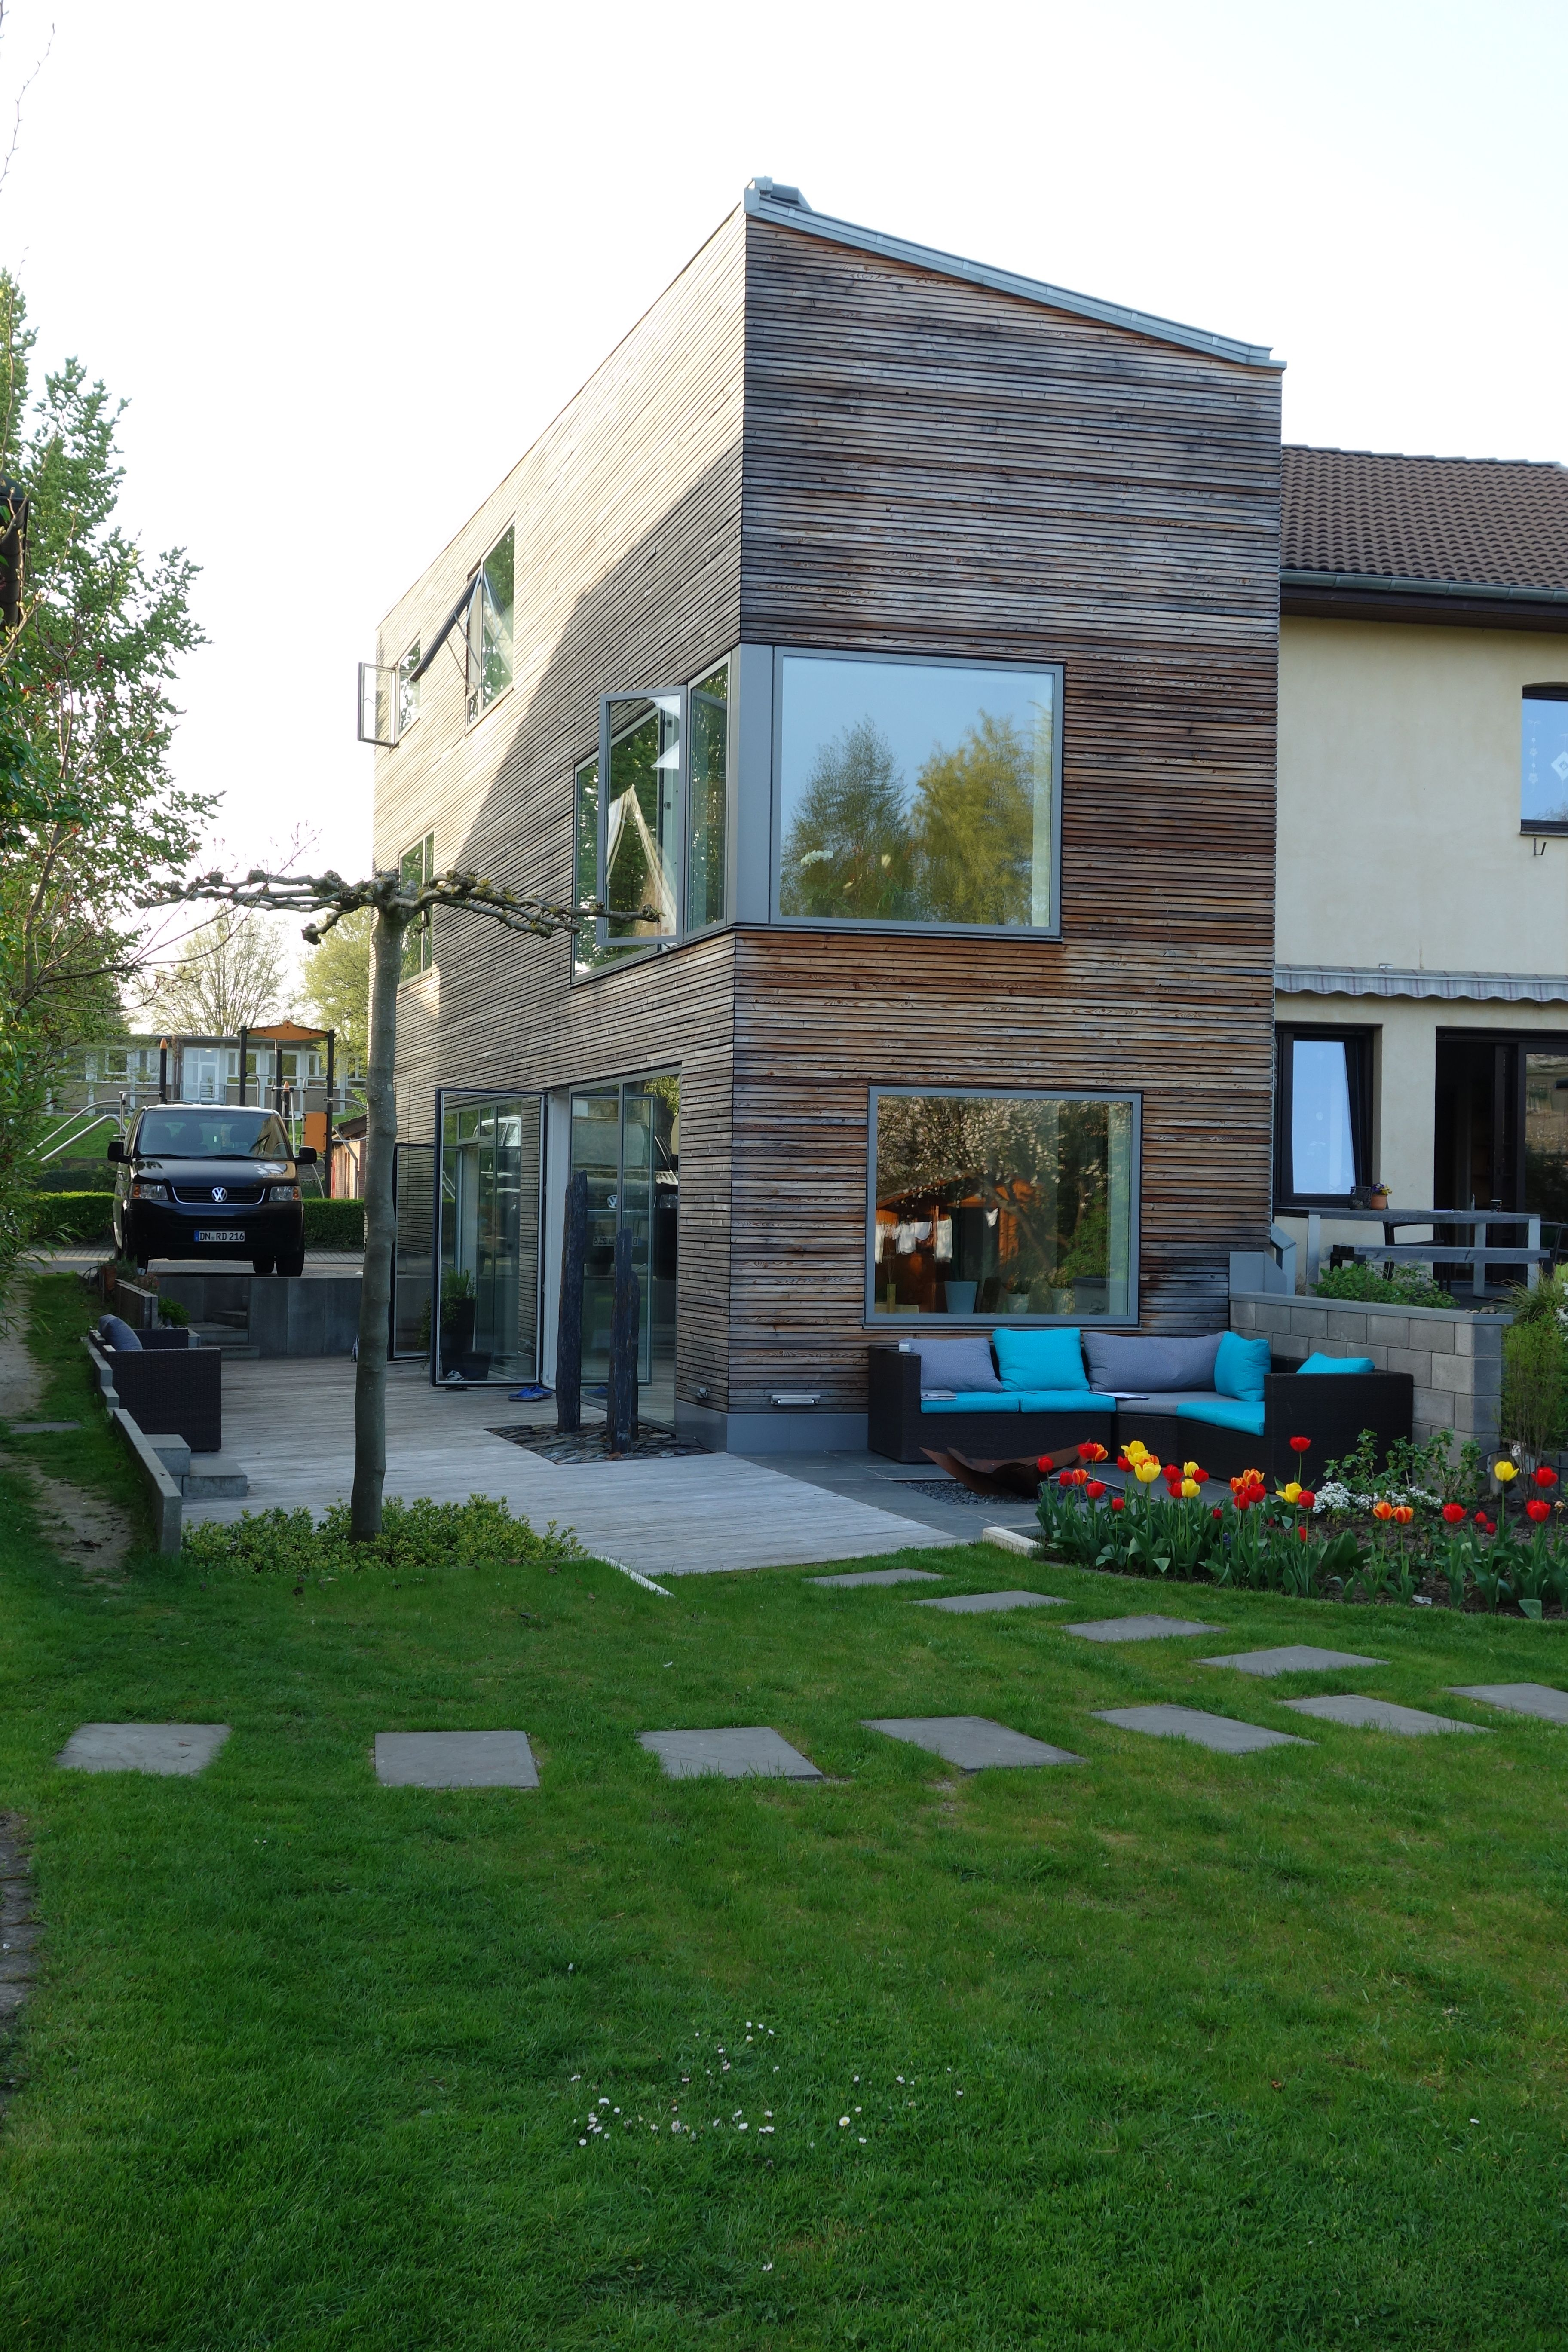 Superb Hausumbau inkl Holzfassade velfac fenster bodentiefefenster fassadenb ndig hausbau